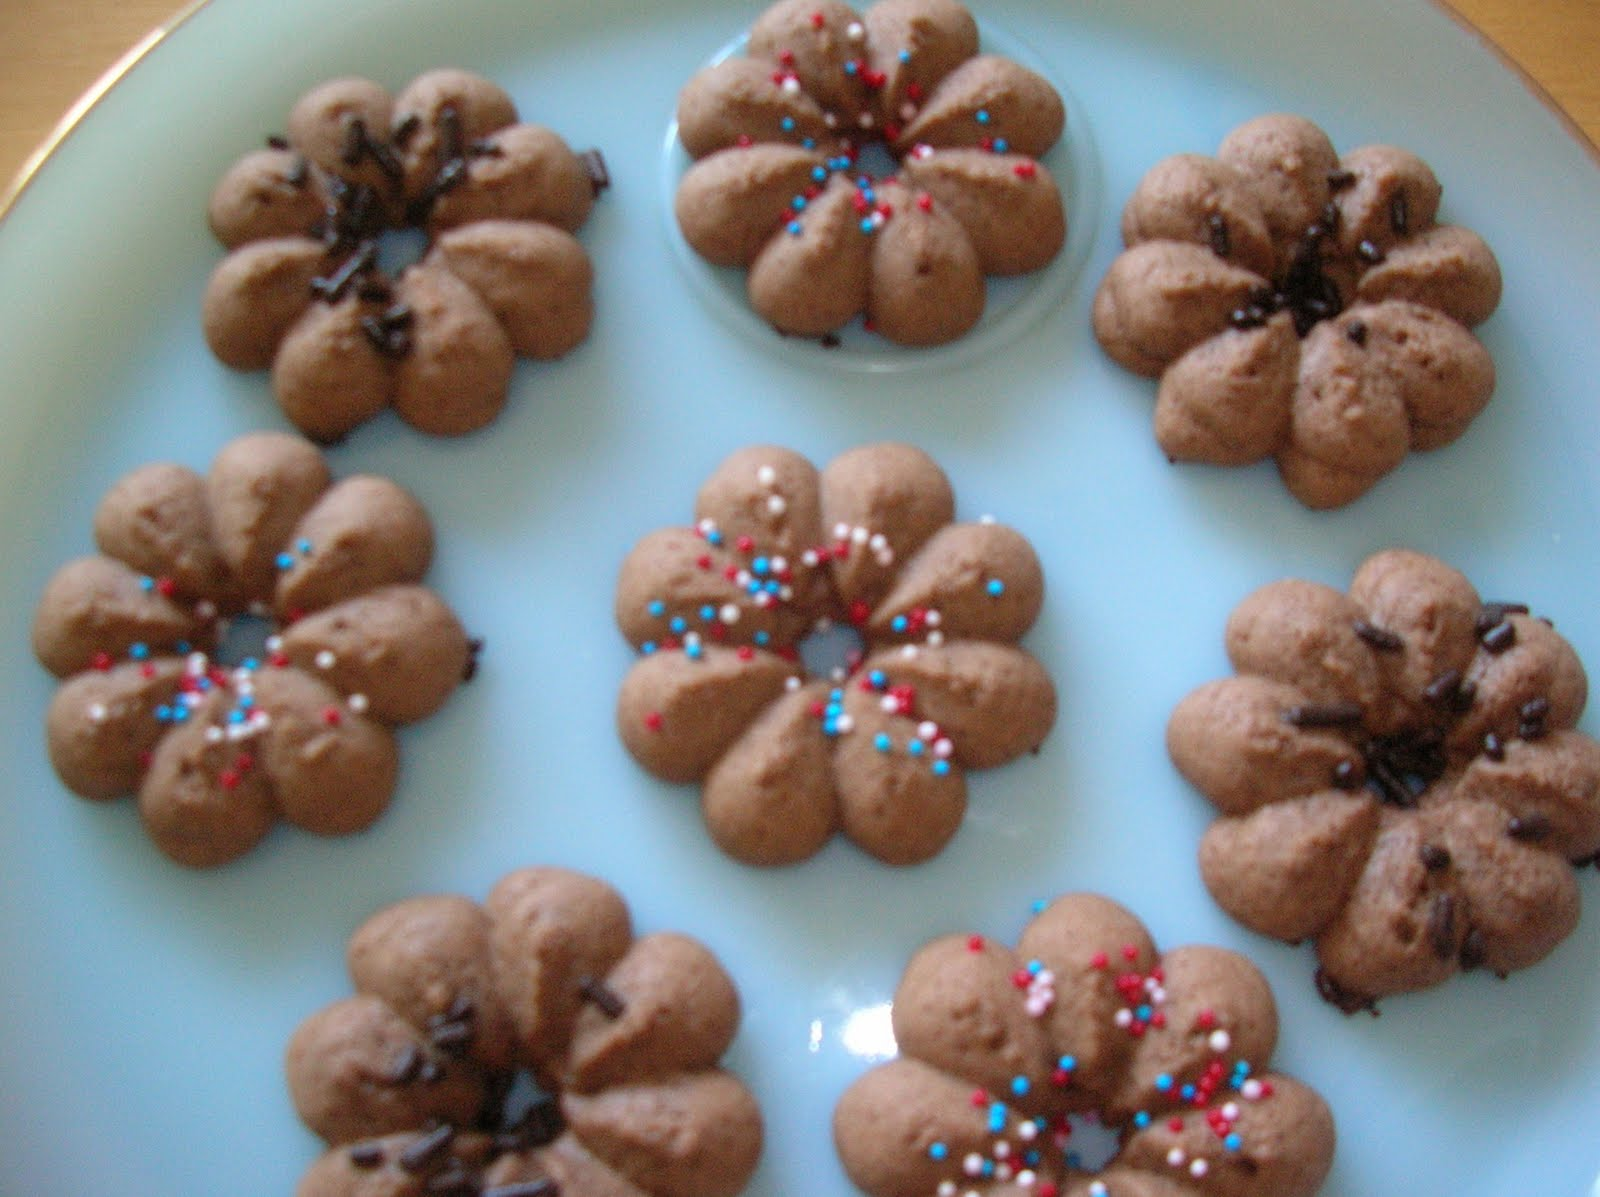 A Year Of Cookies Cookie Recipe 194 Chocolate Spritz Cookies 2